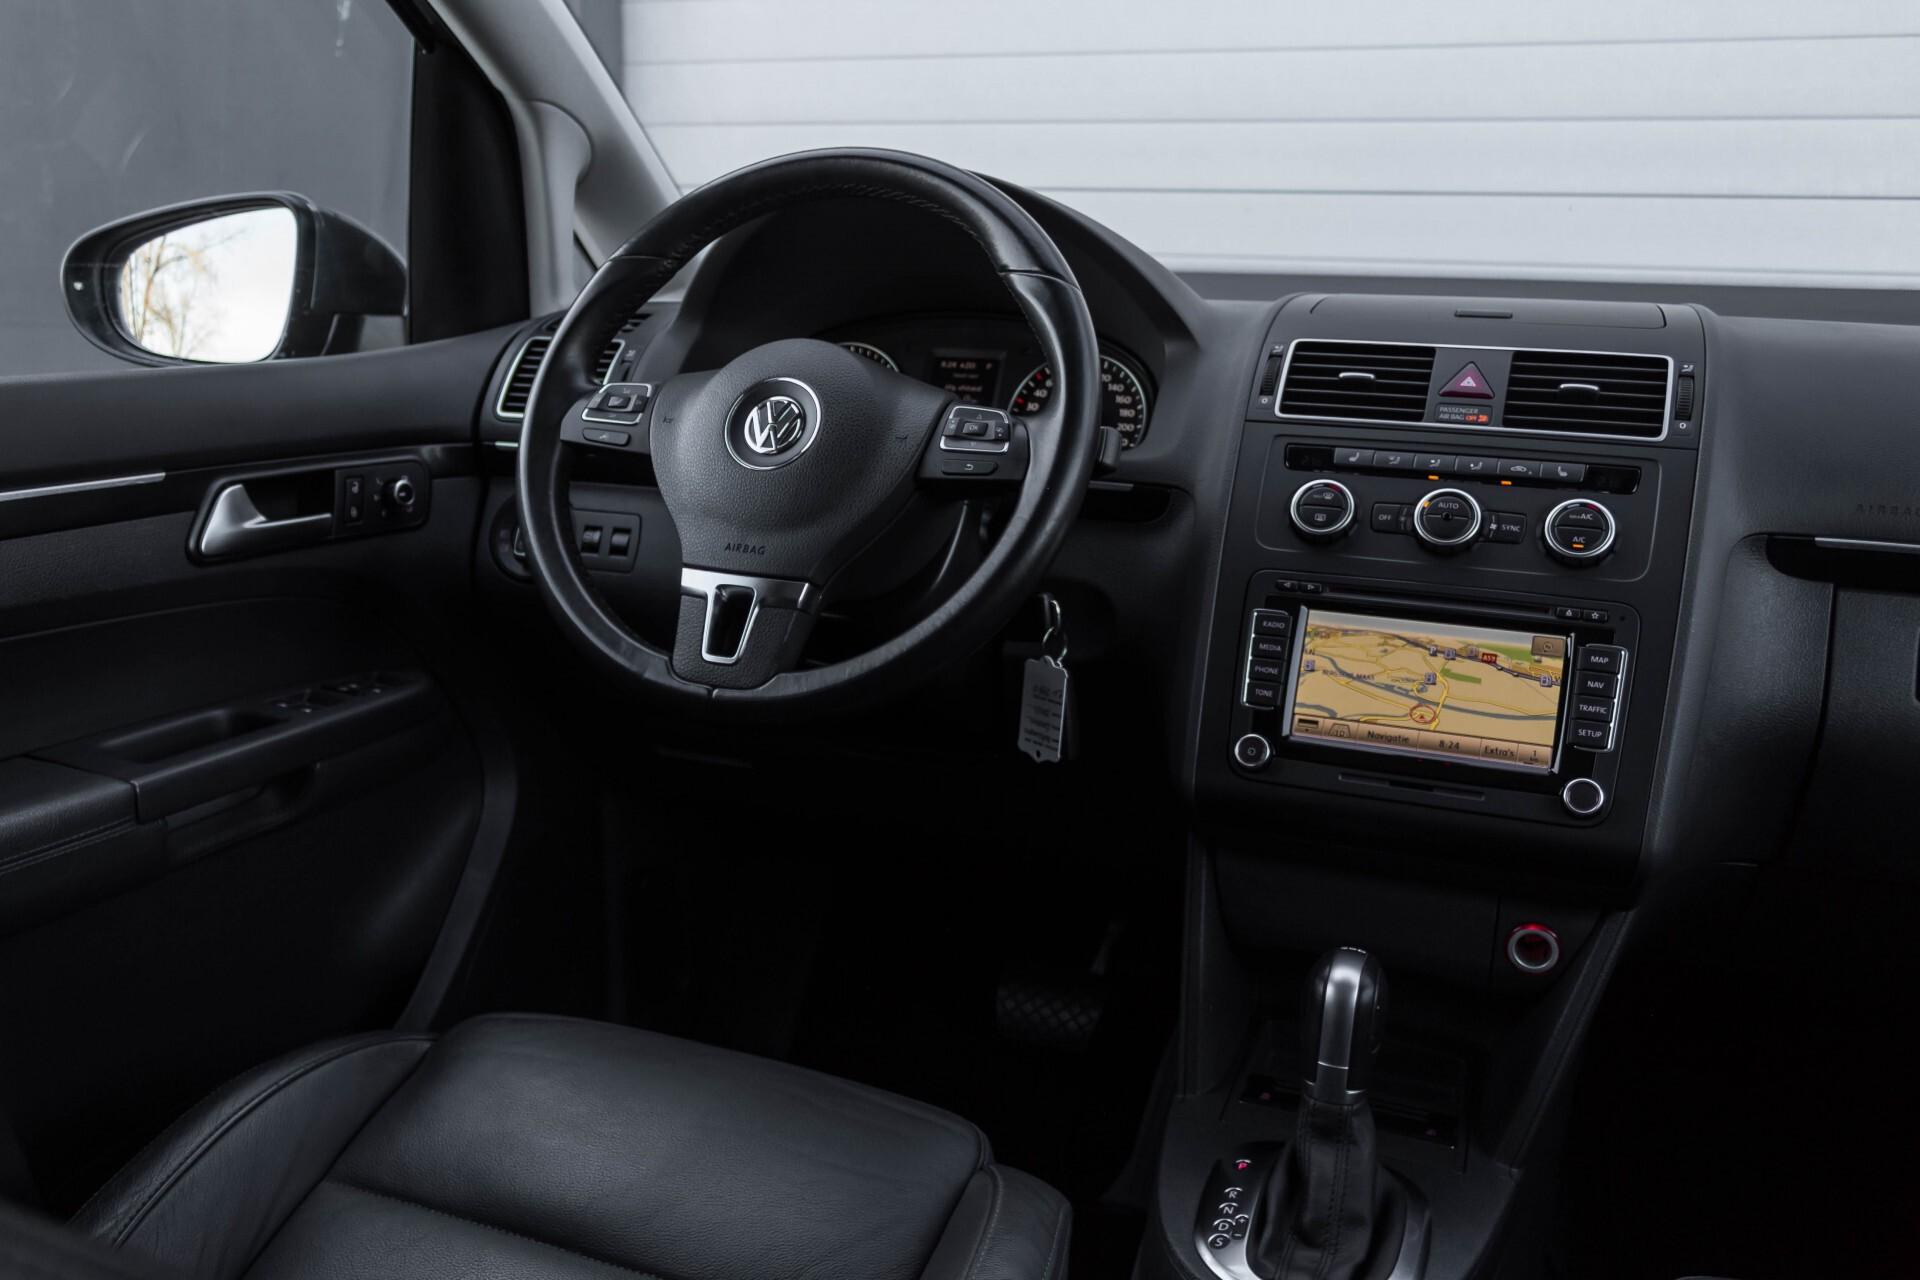 Volkswagen Touran 2.0 TDI Highline 7Persoons 177pk Panorama/Leder/Navi/Camera/Verw-Stln/Trhk/ECC/Xenon Aut Foto 8